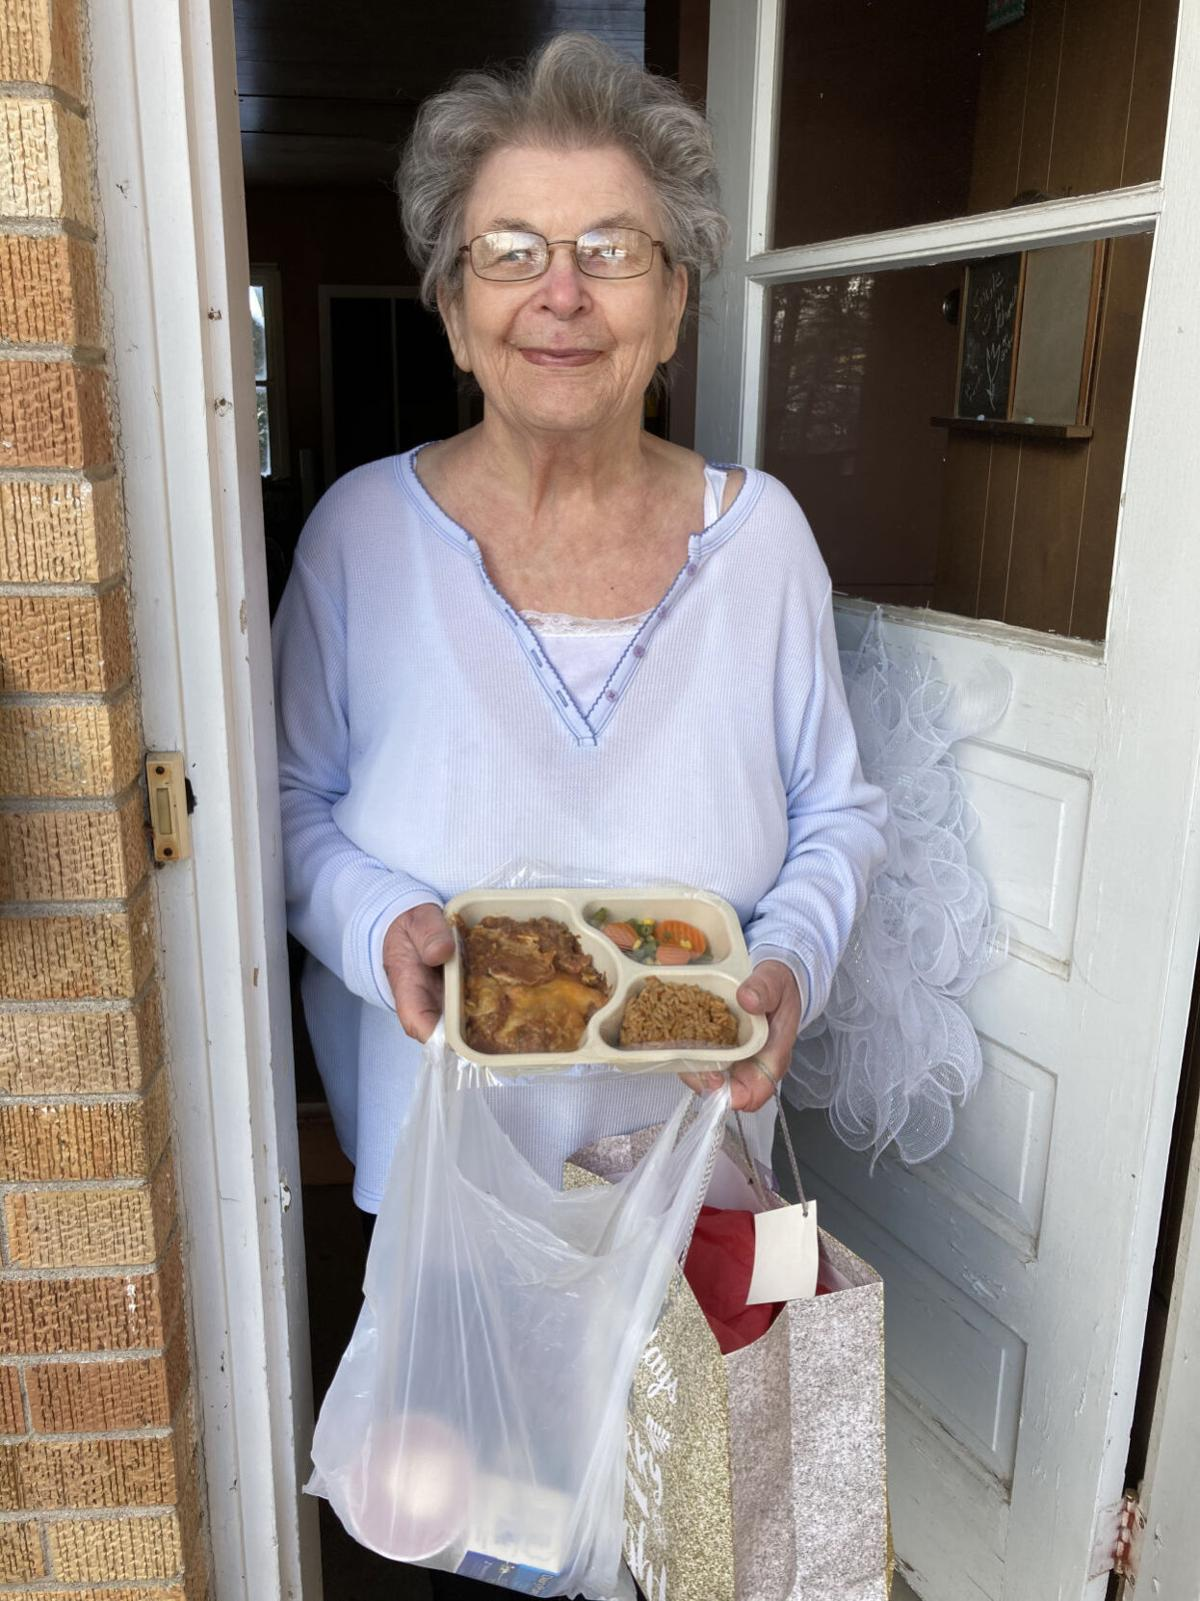 Marinette County Elderly Services